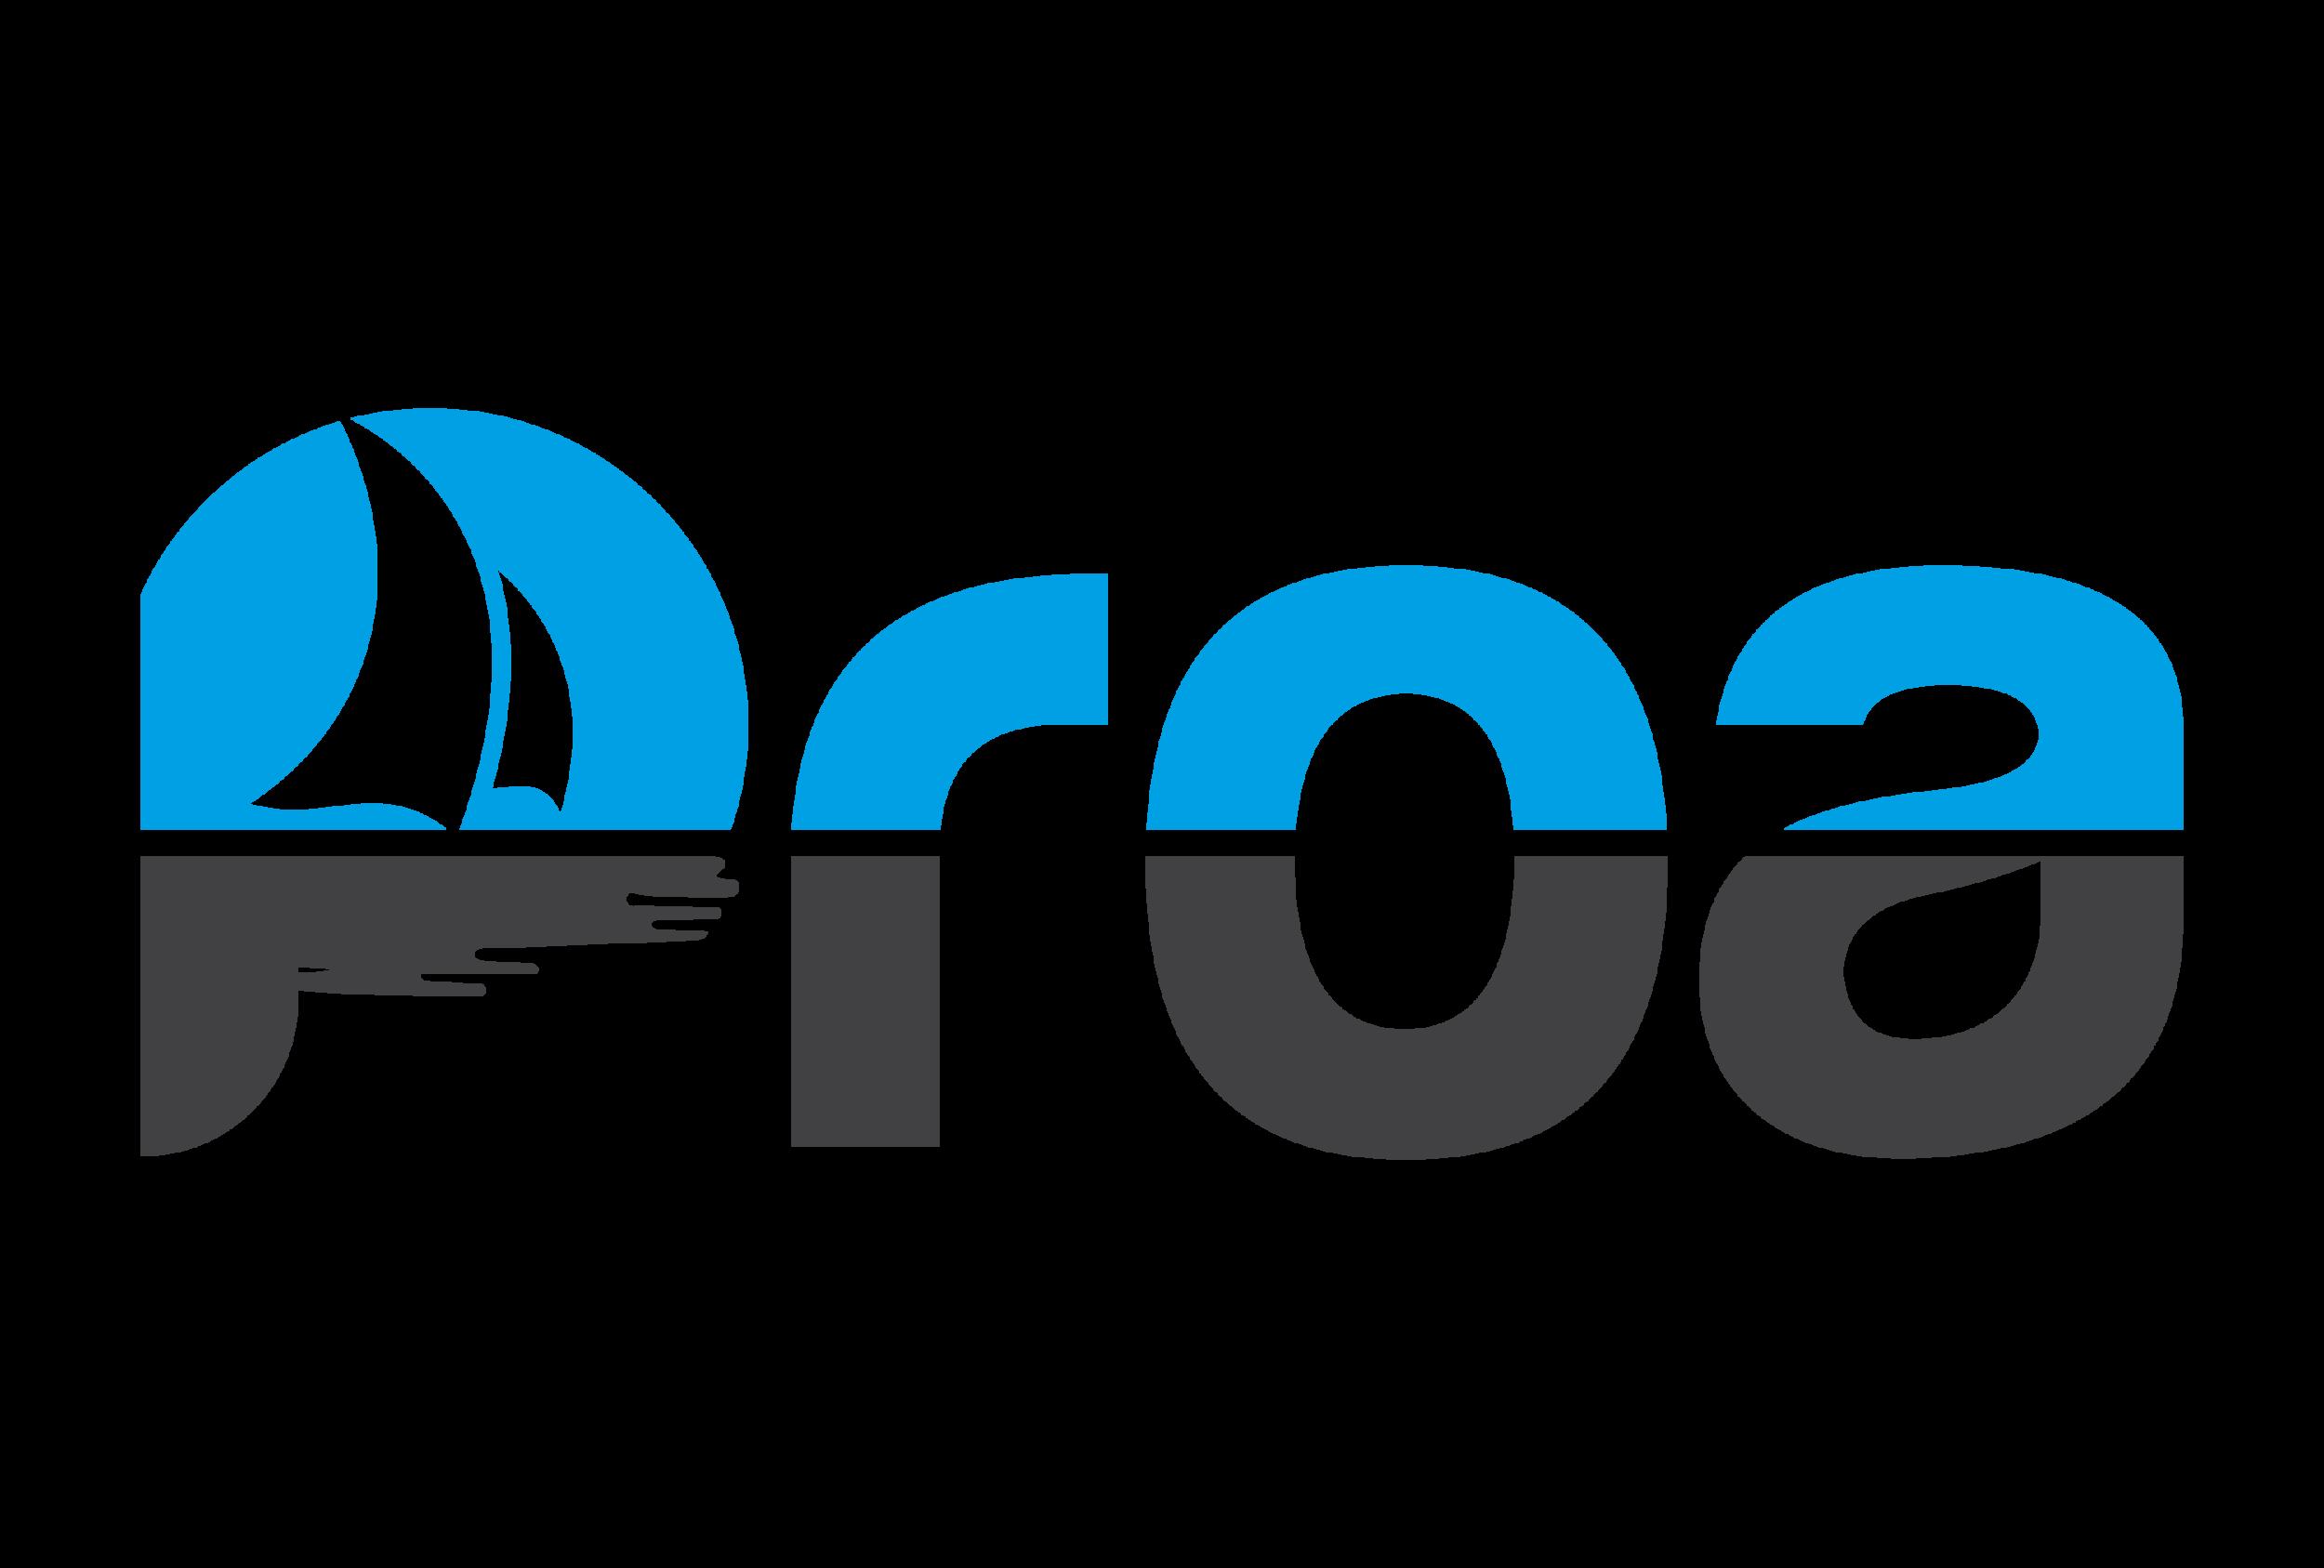 PROA01.png